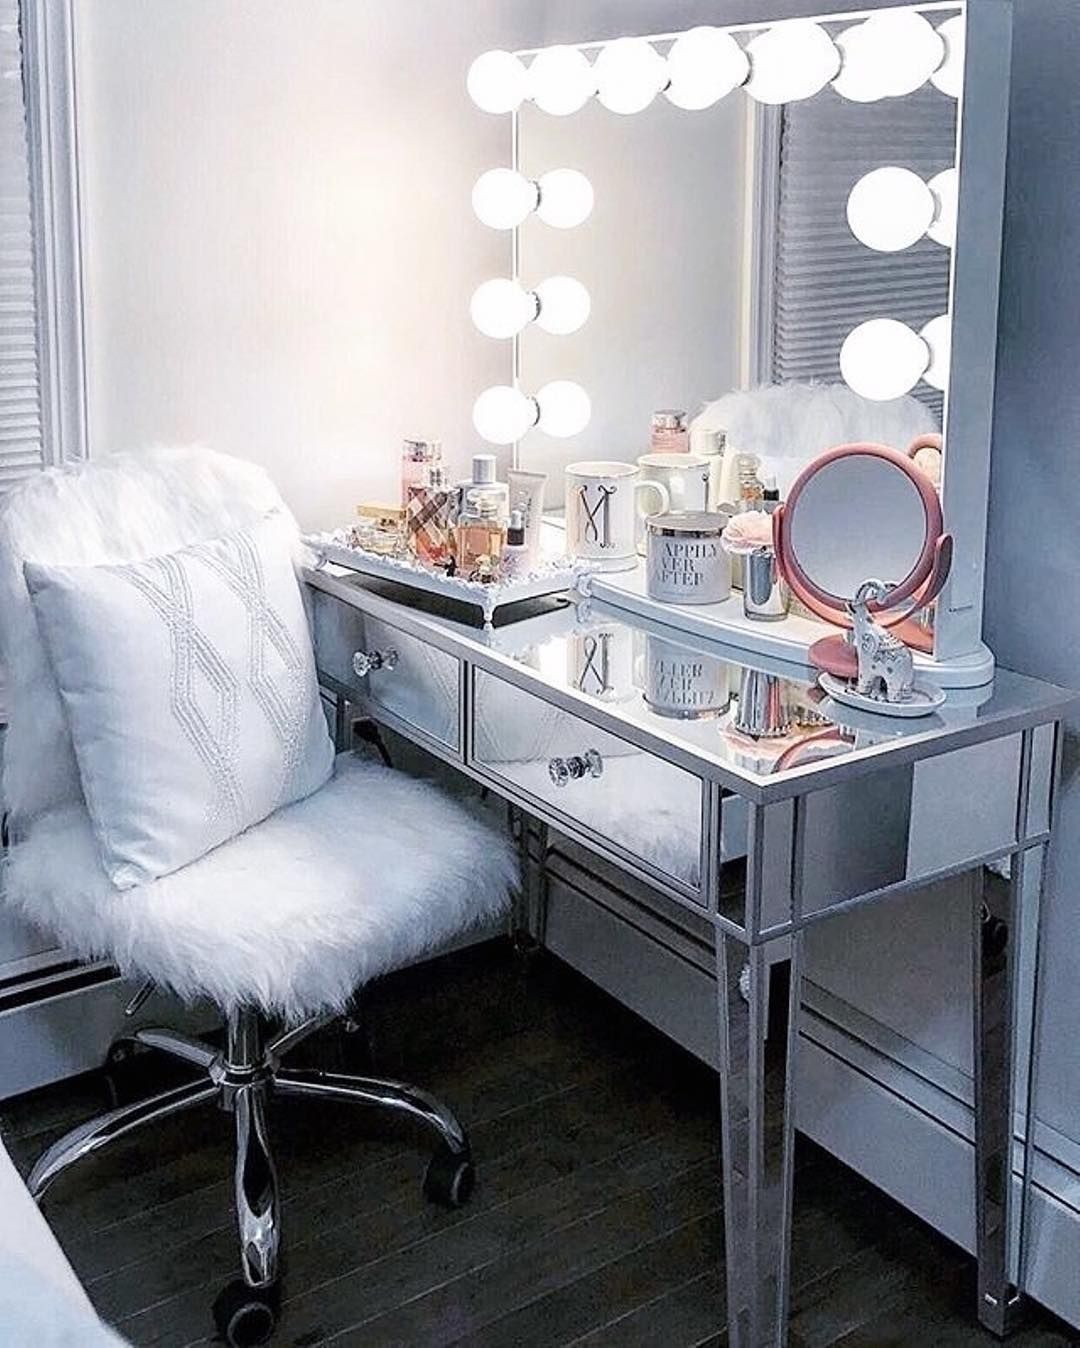 Sophie Premium Mirrored Vanity Table - Impressions Vanity Co